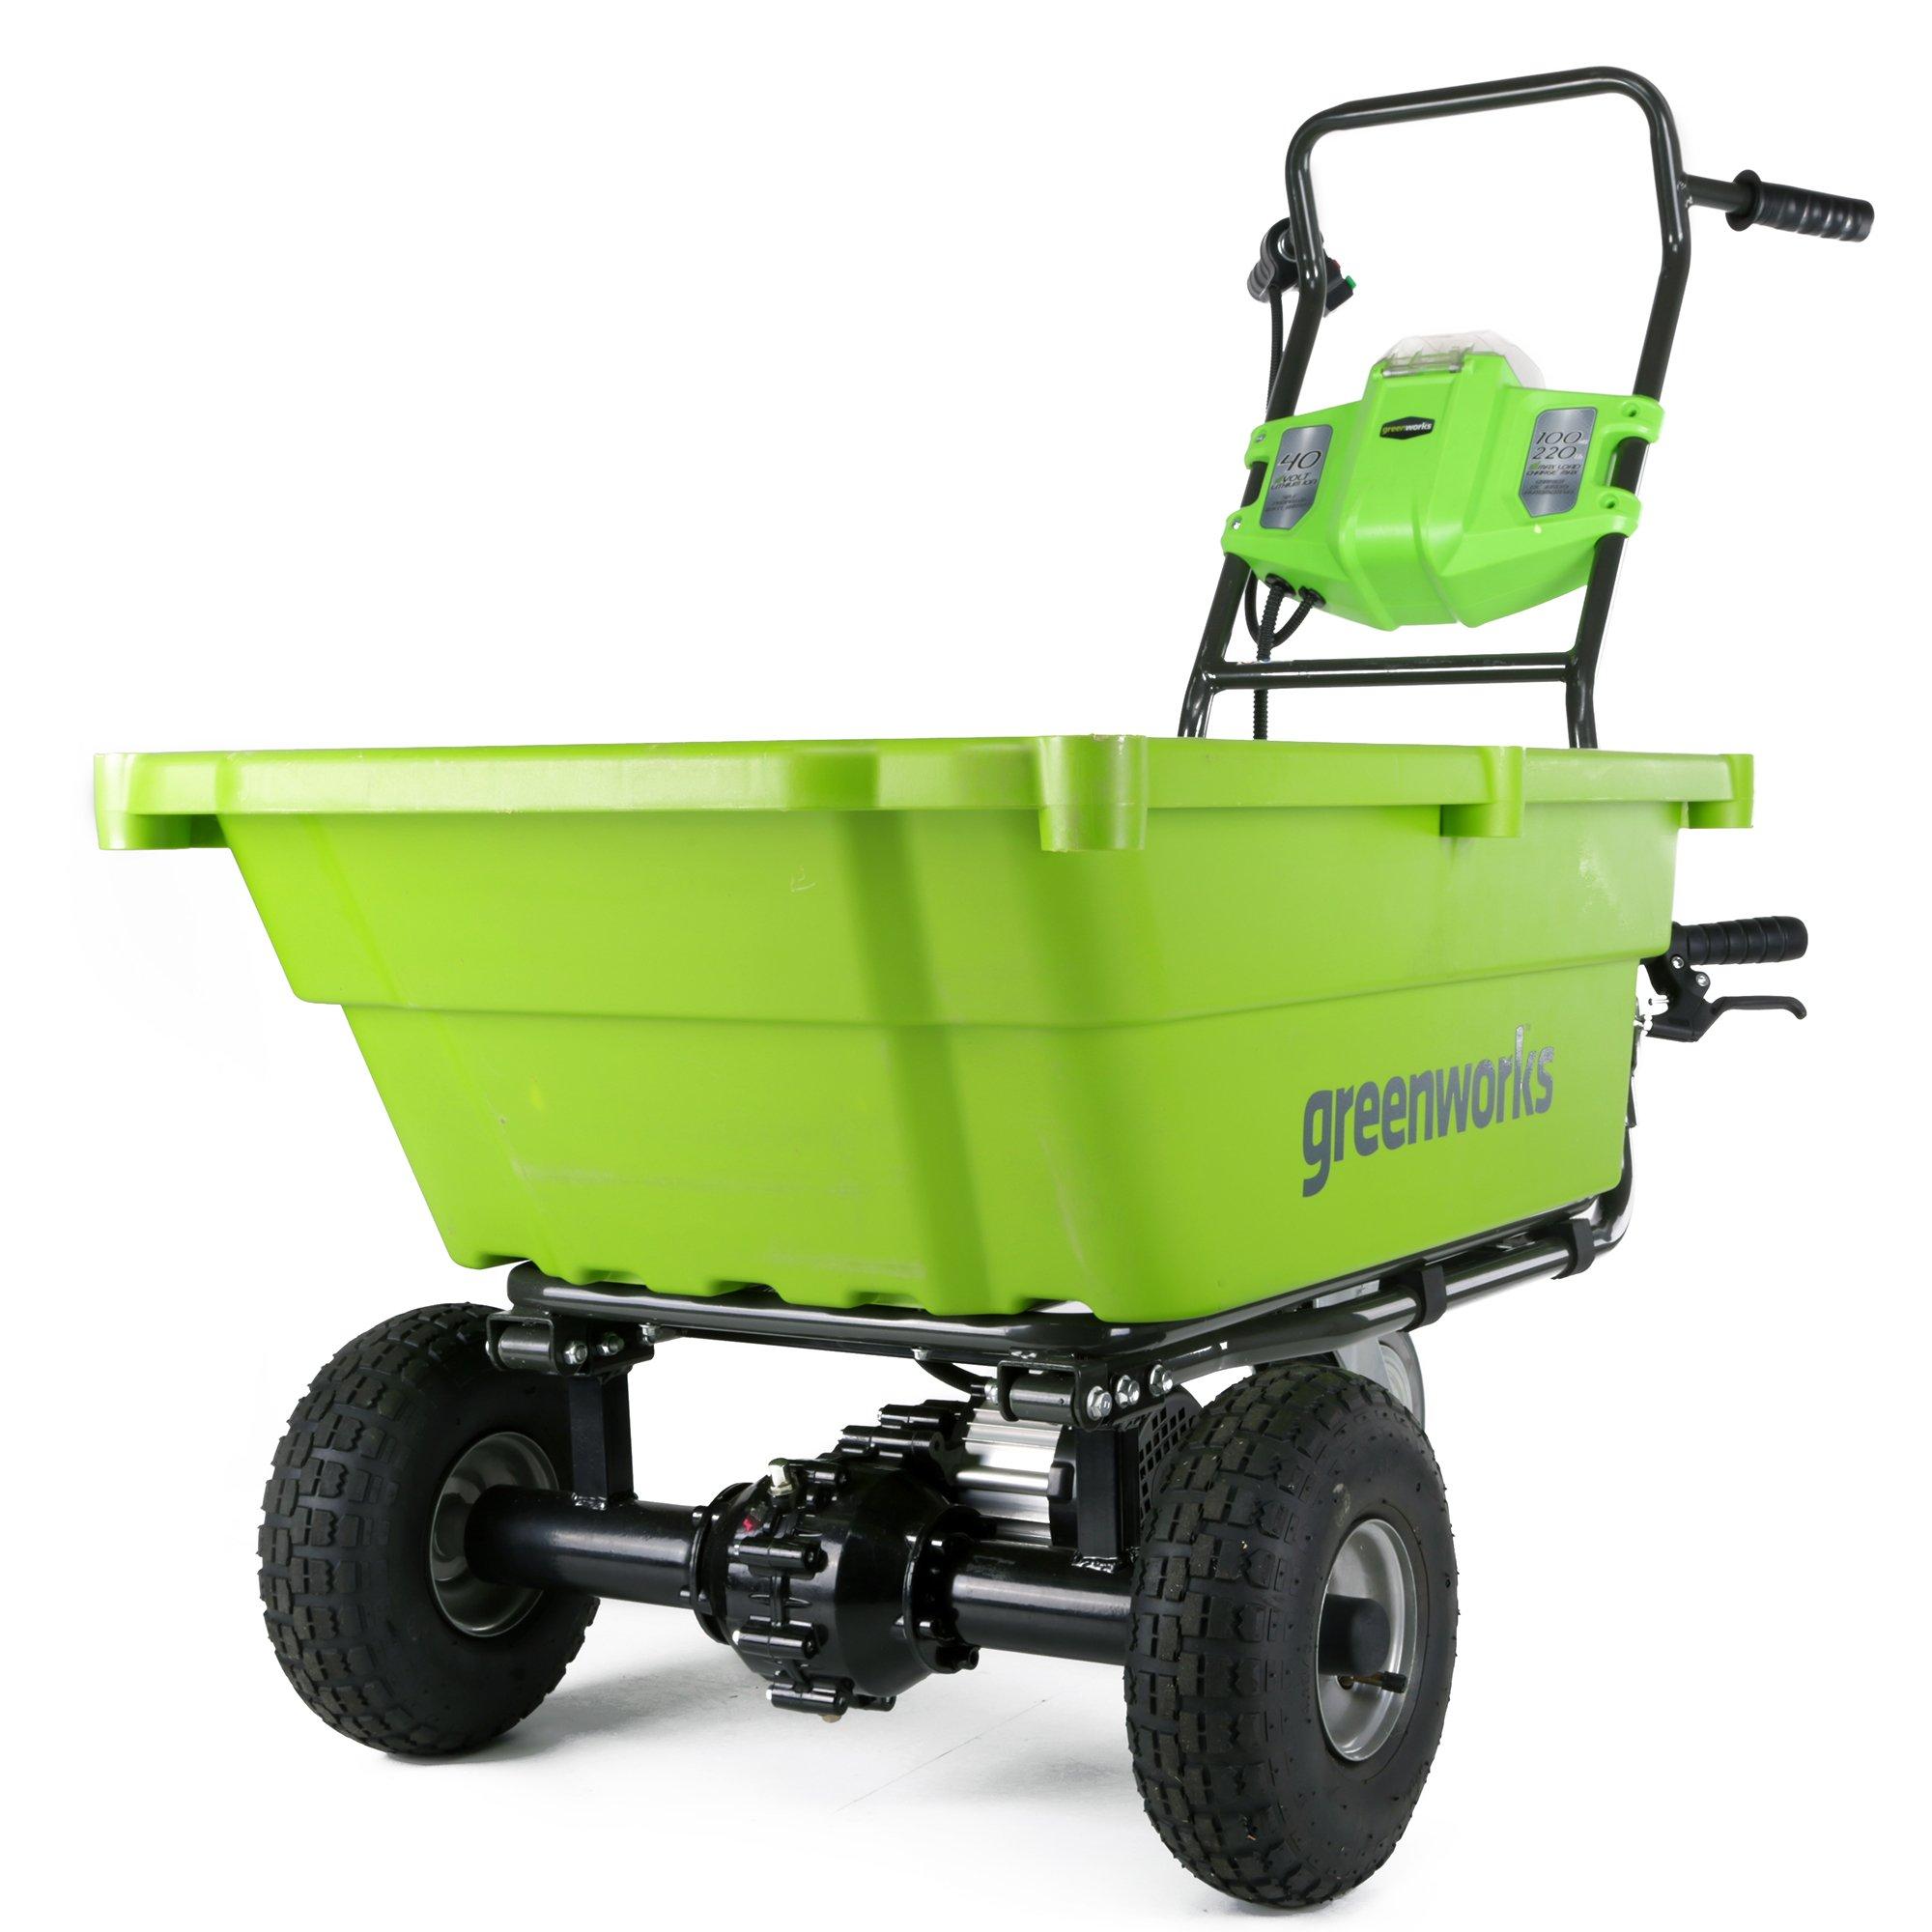 Greenworks 40V Cordless Garden Cart, Battery Not Included GC40L00